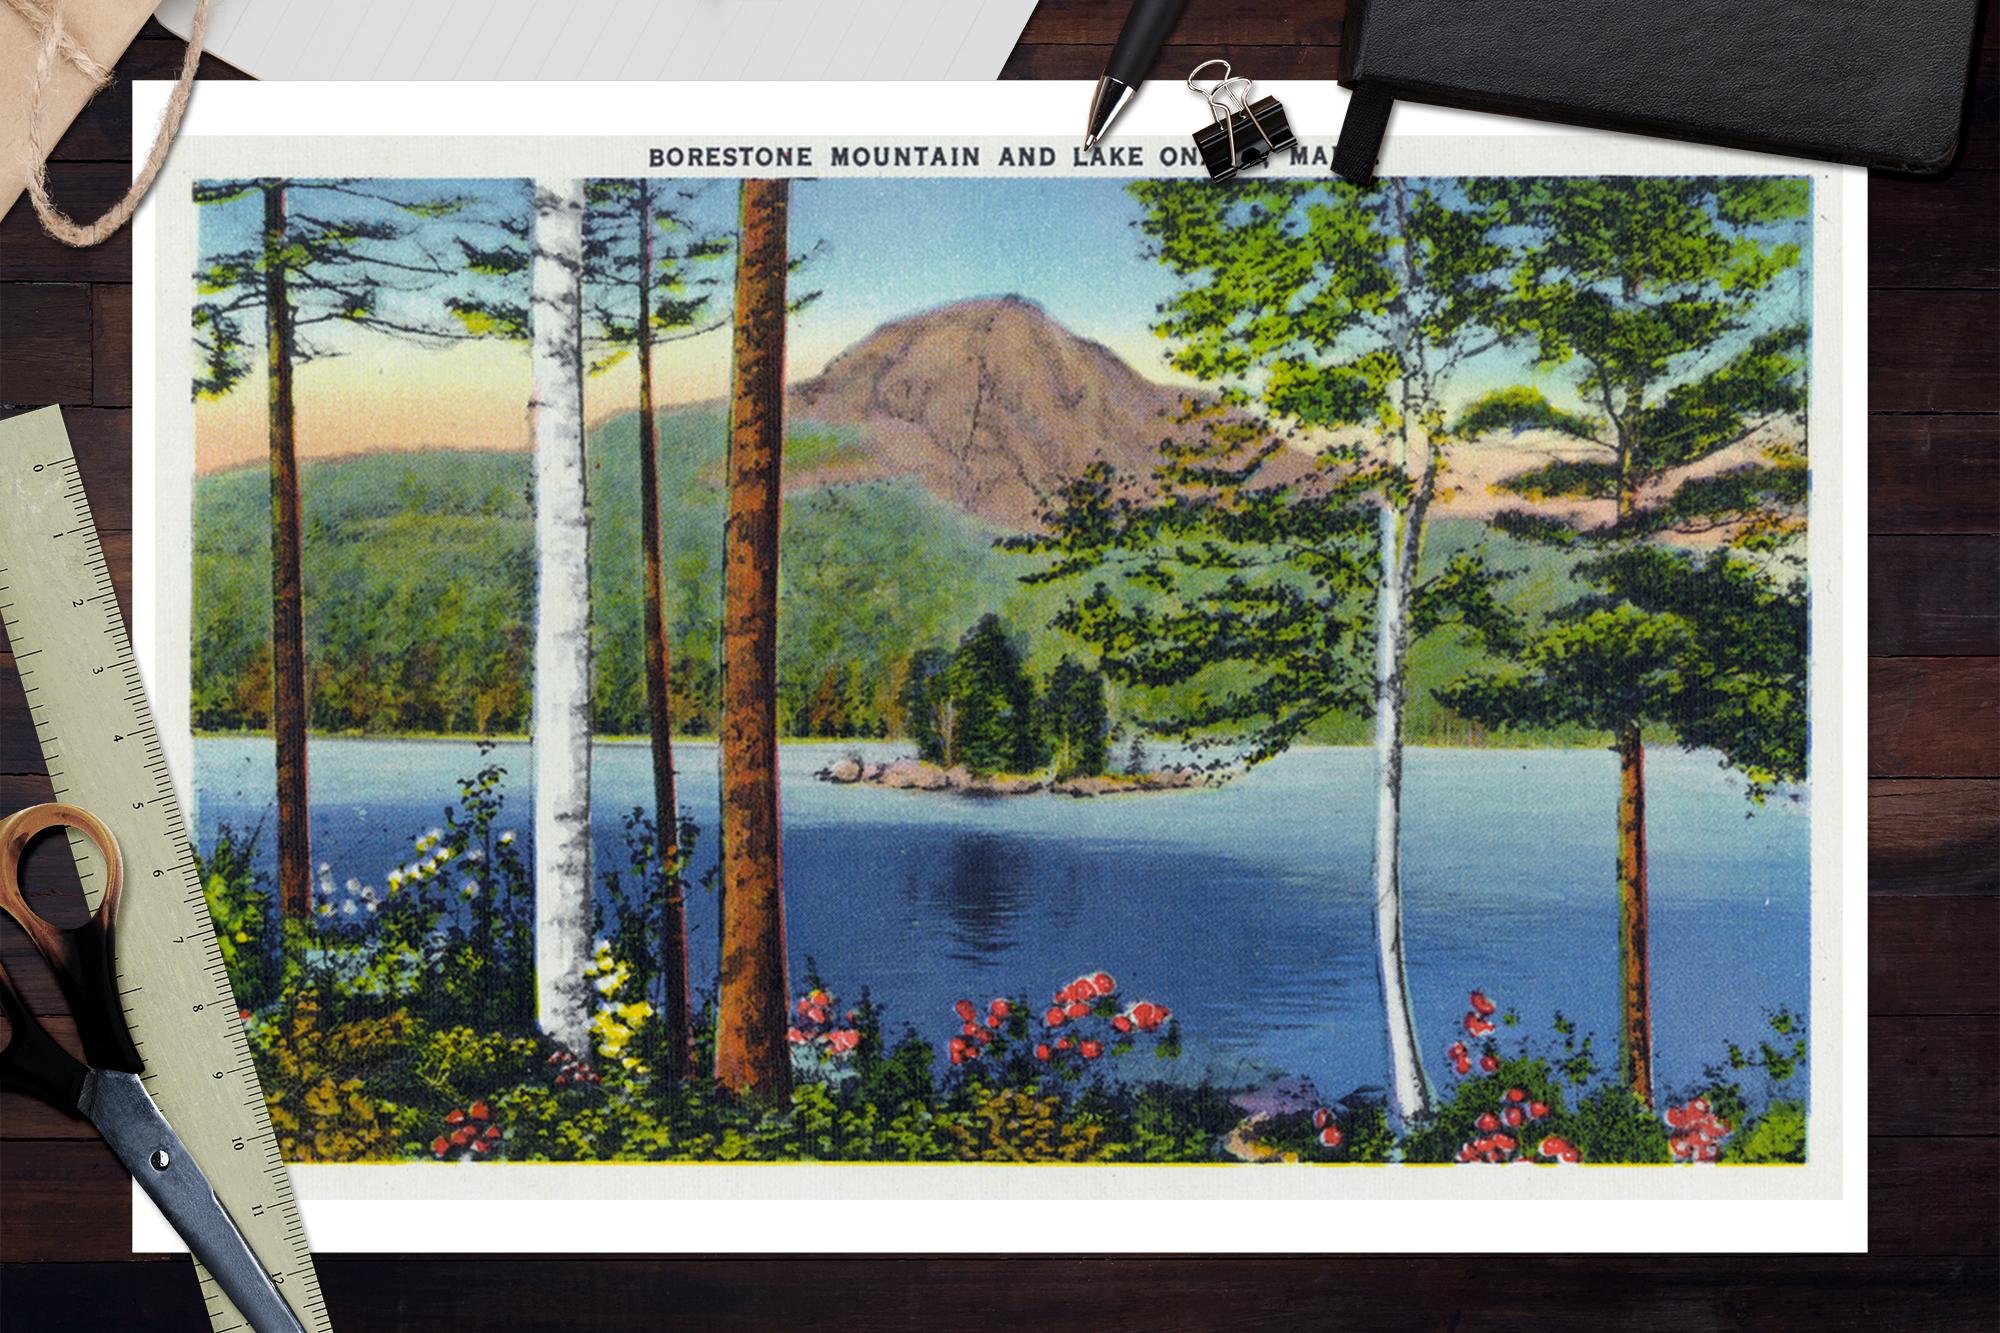 Lake Onawa Maine Borestone Mountain /& Lake Art Prints, Signs, Canvas, More